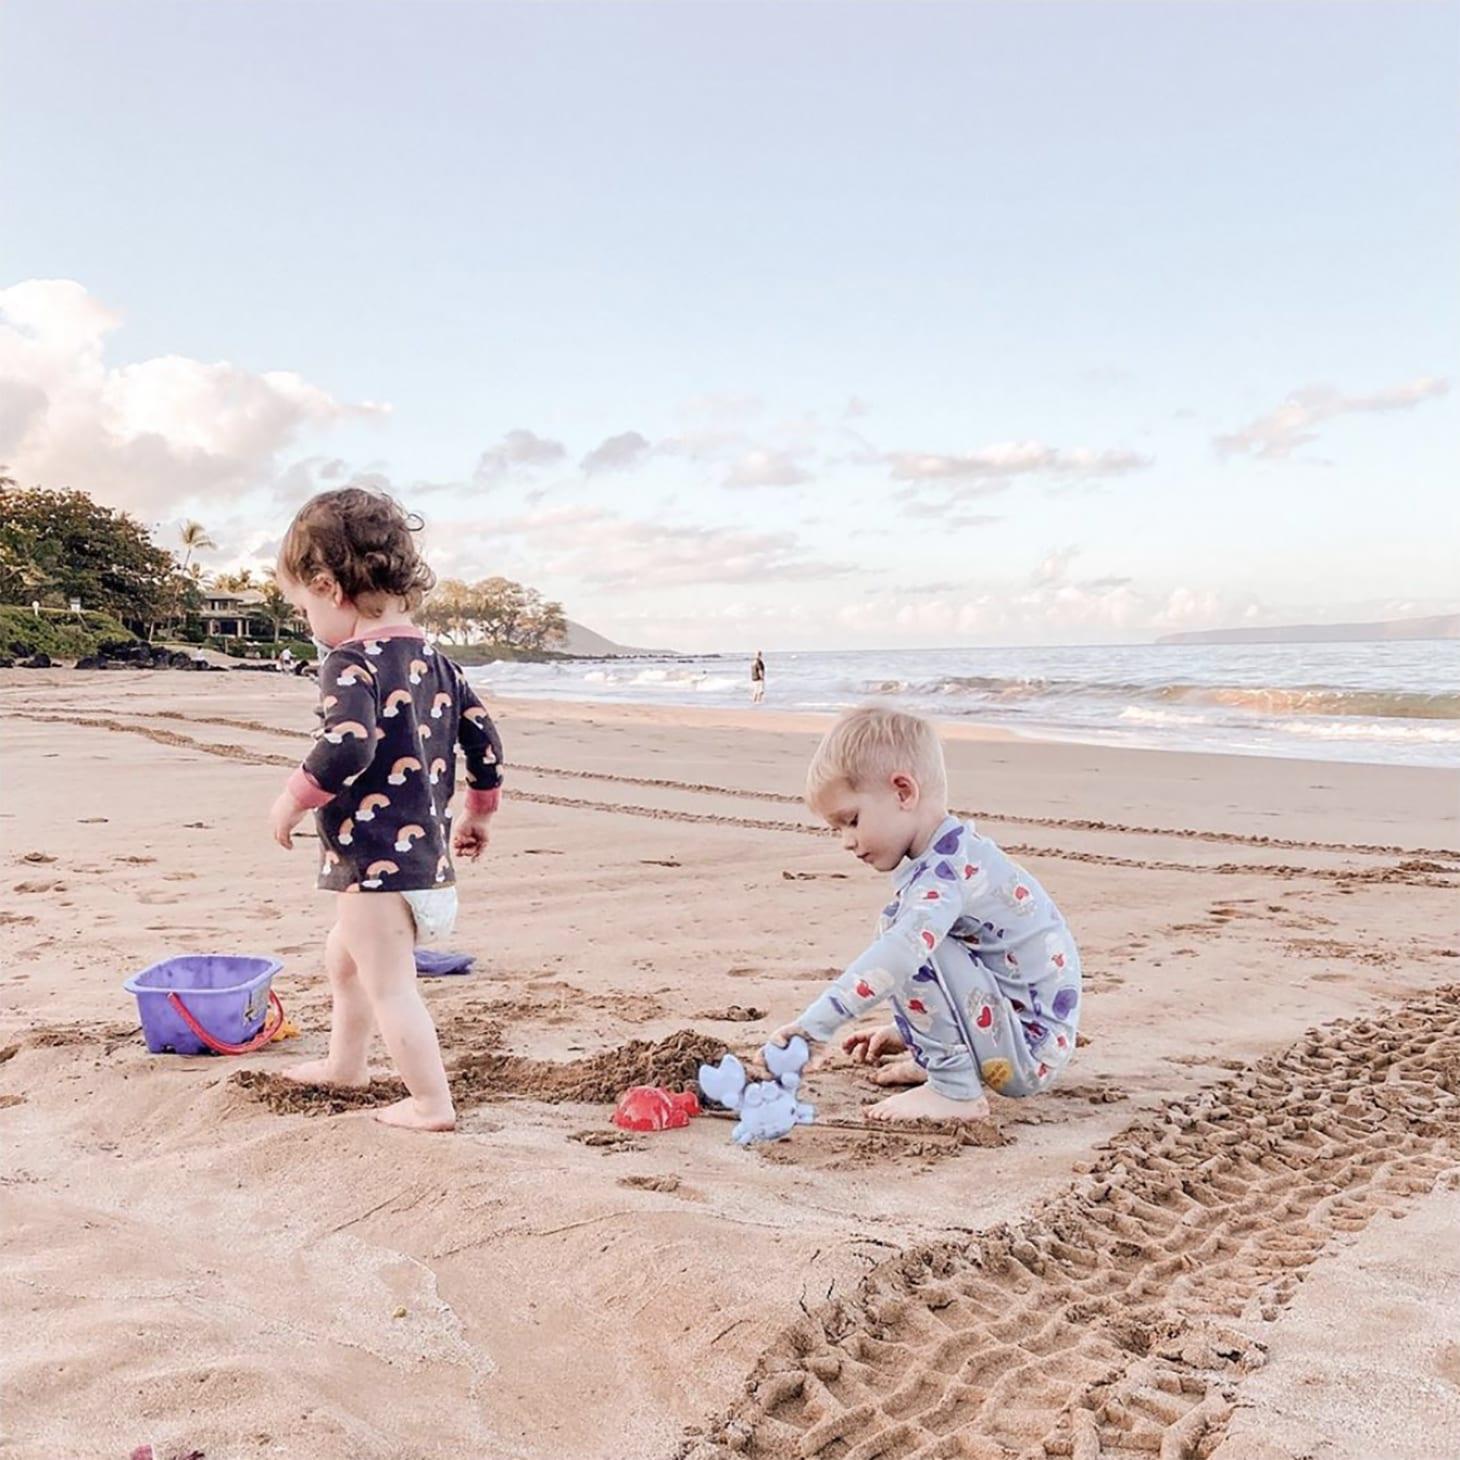 Making Sandcastles in Maui